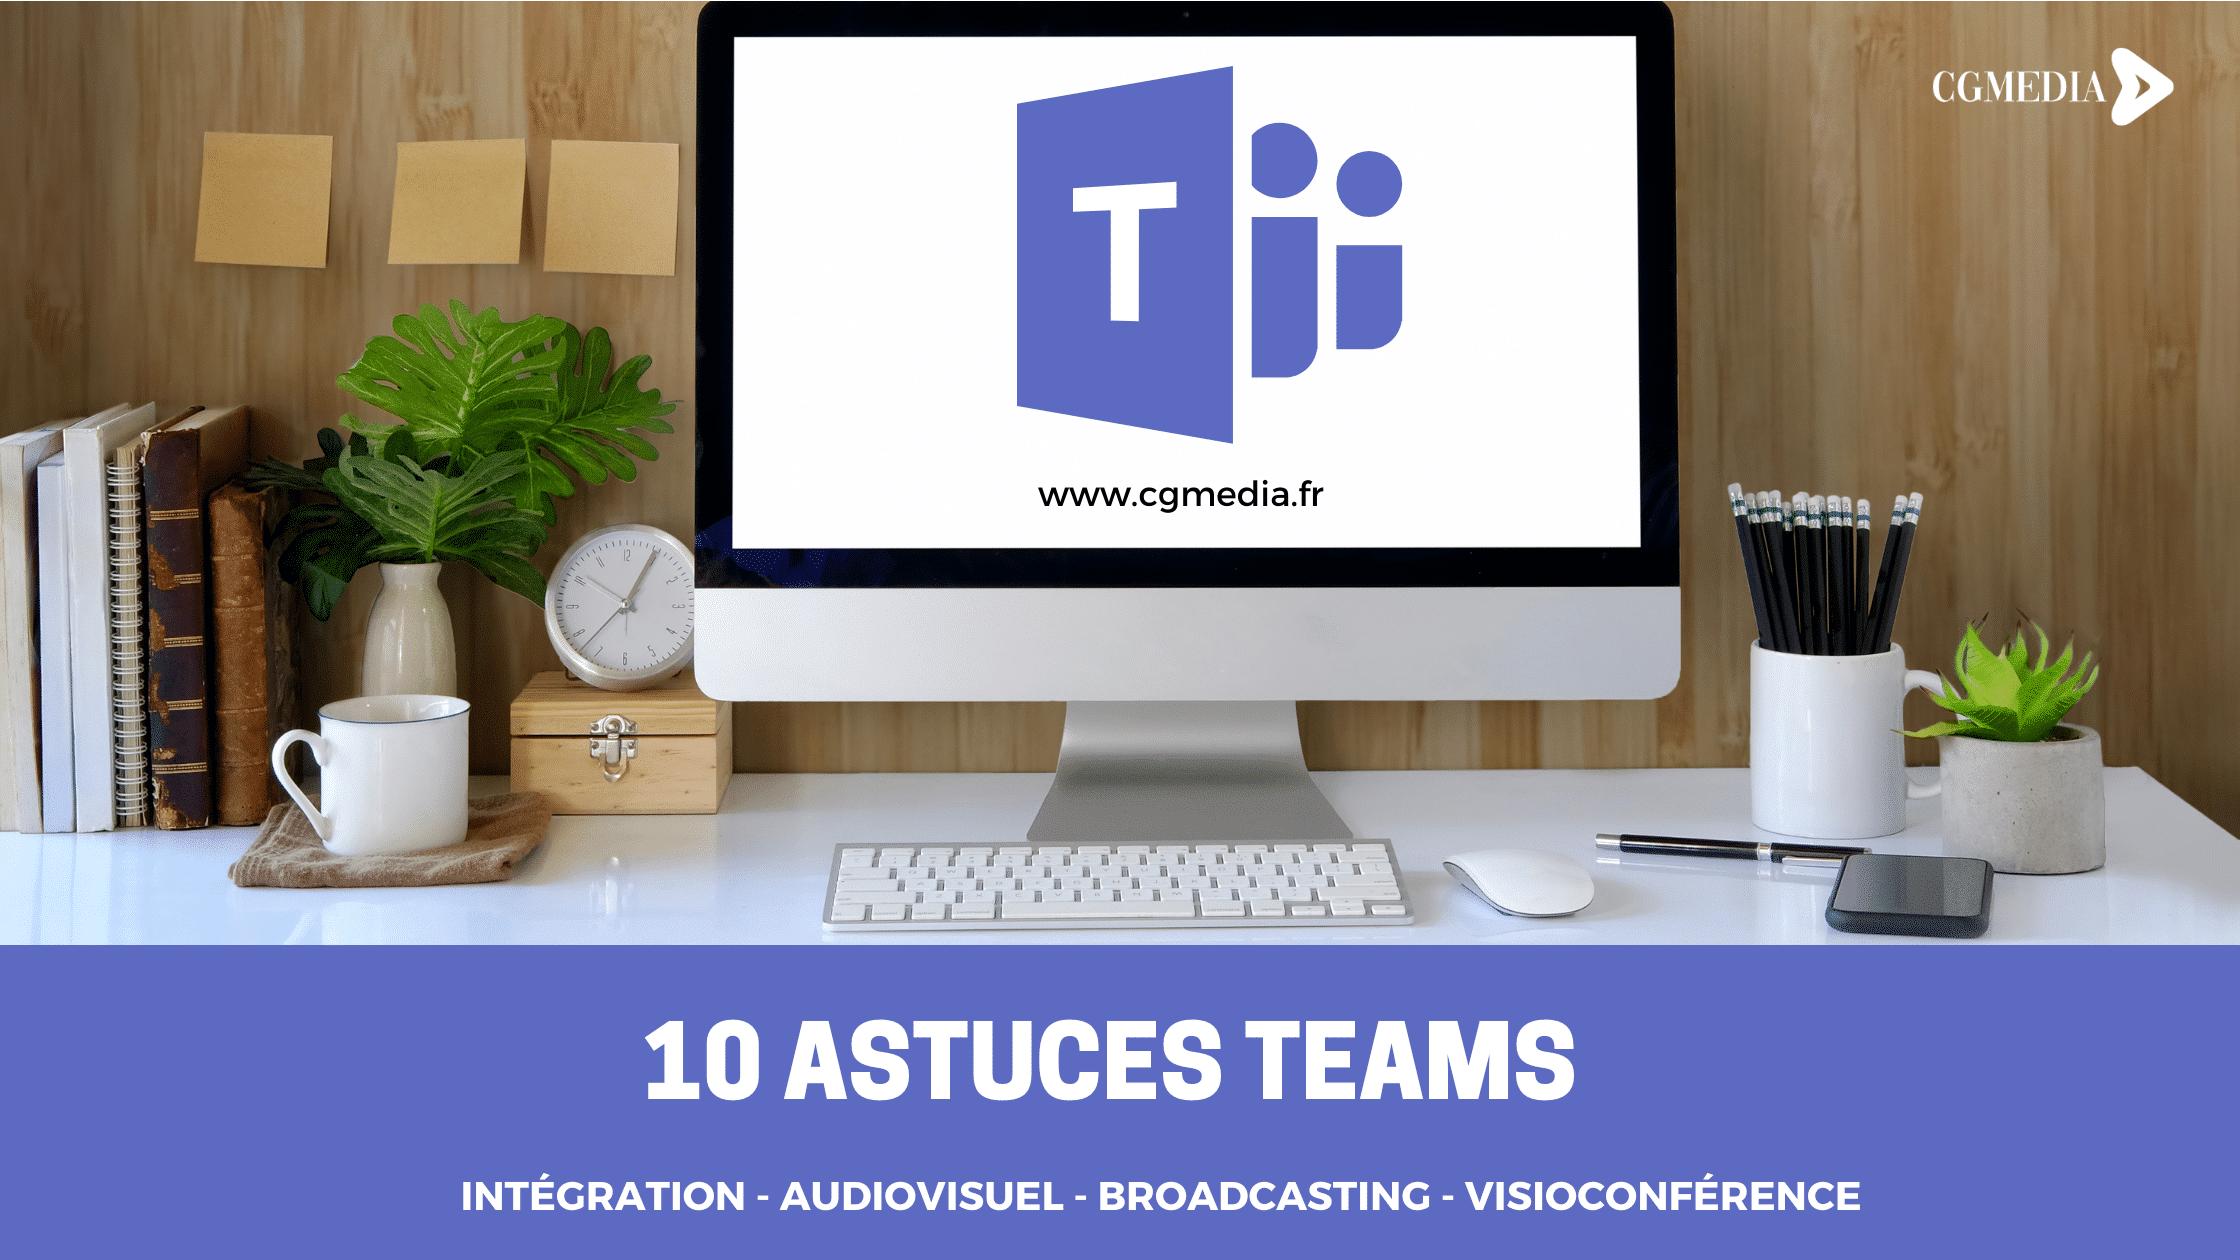 Voici 10 astuces pour bien utiliser Microsoft Teams - CGMEDIA